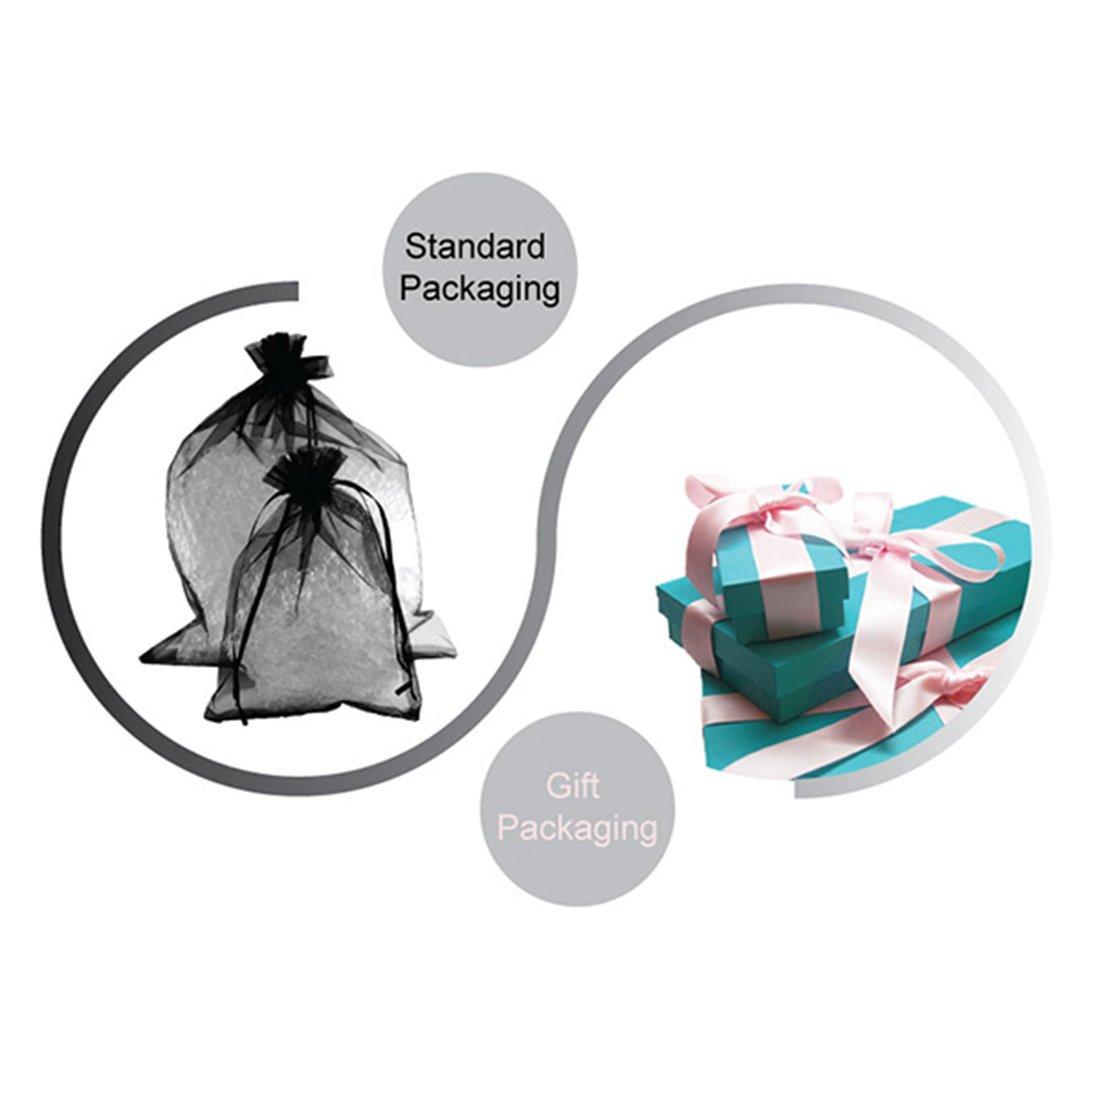 Audrey Hepburn ''Breakfast at Tiffany's'' Complete Costume Set - Satin Version (S) w/Gift Box by Utopiat (Image #7)